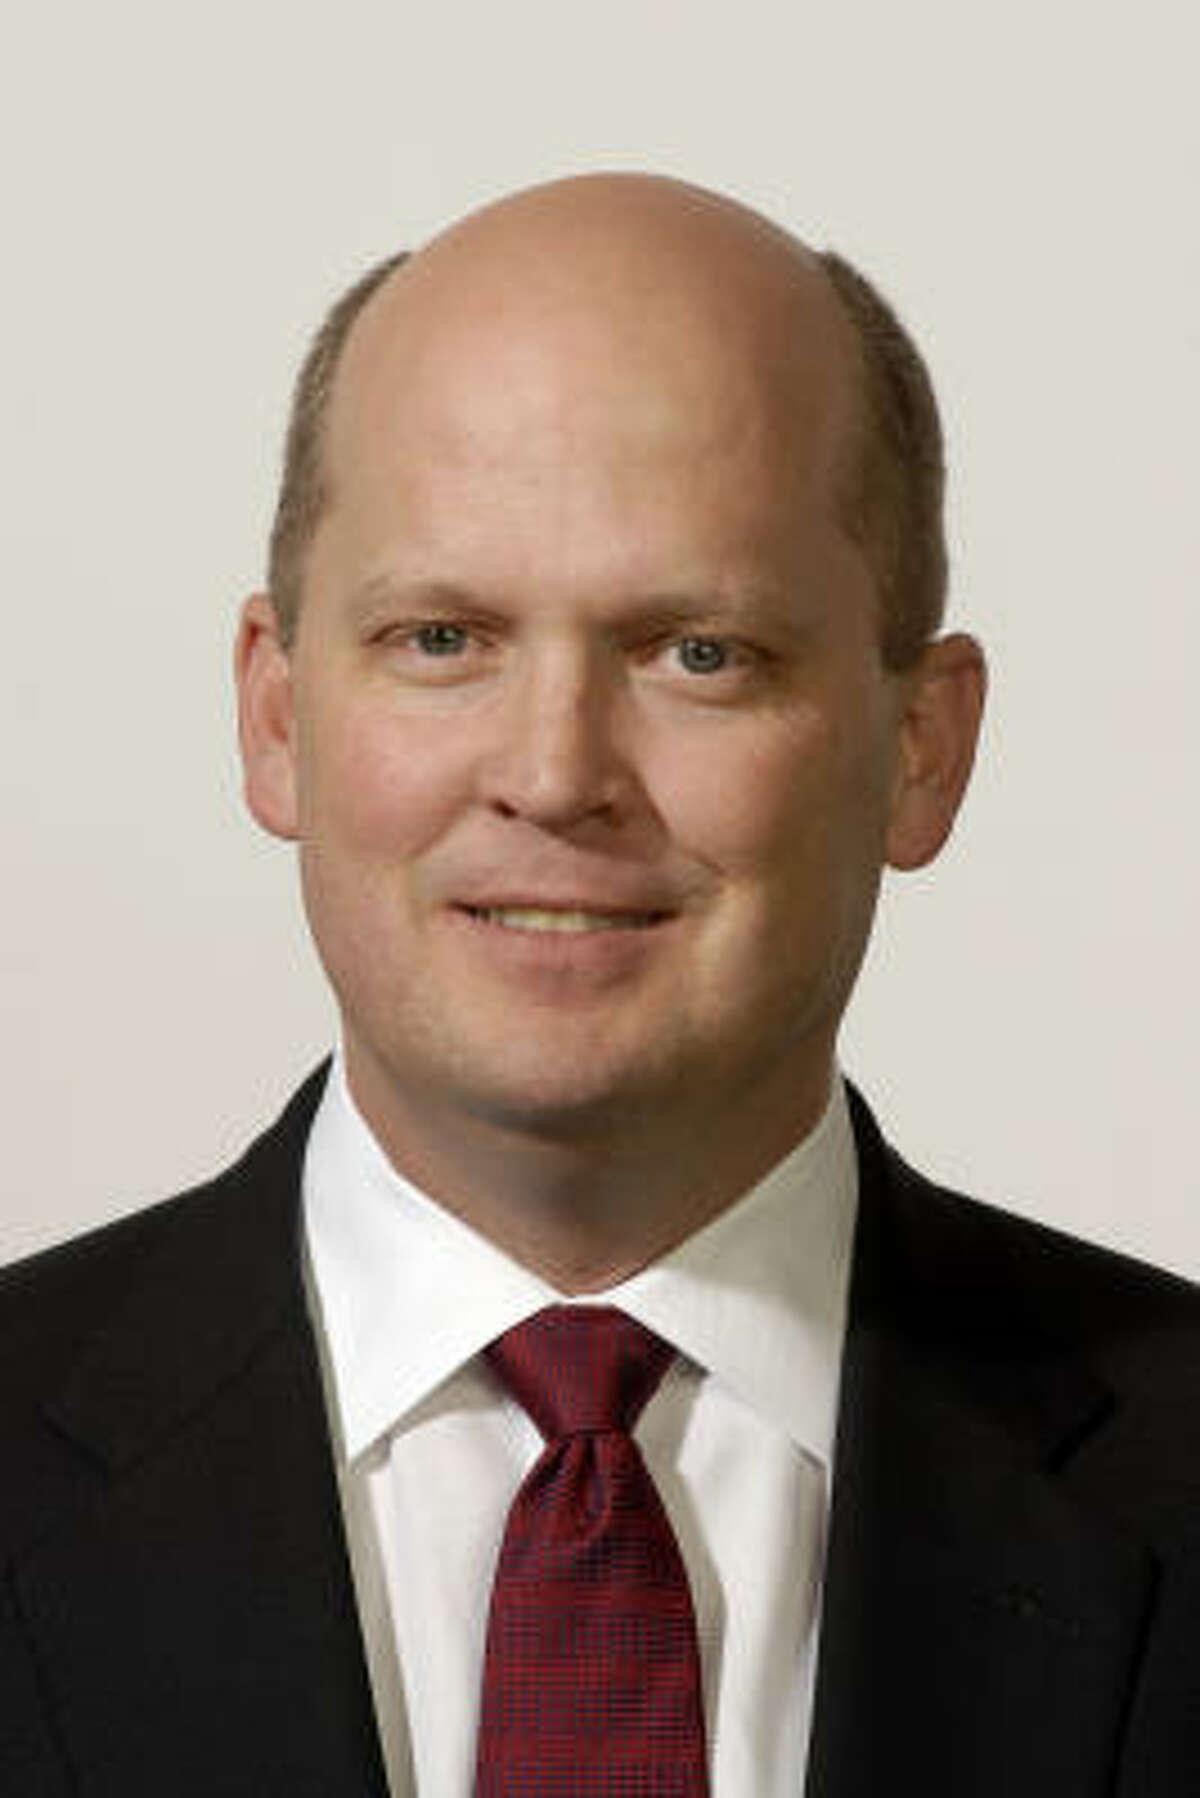 Mikal Watts of San Antonio is running for the Democratic senatorial nomination against Houston state Rep. Rick Noriega.